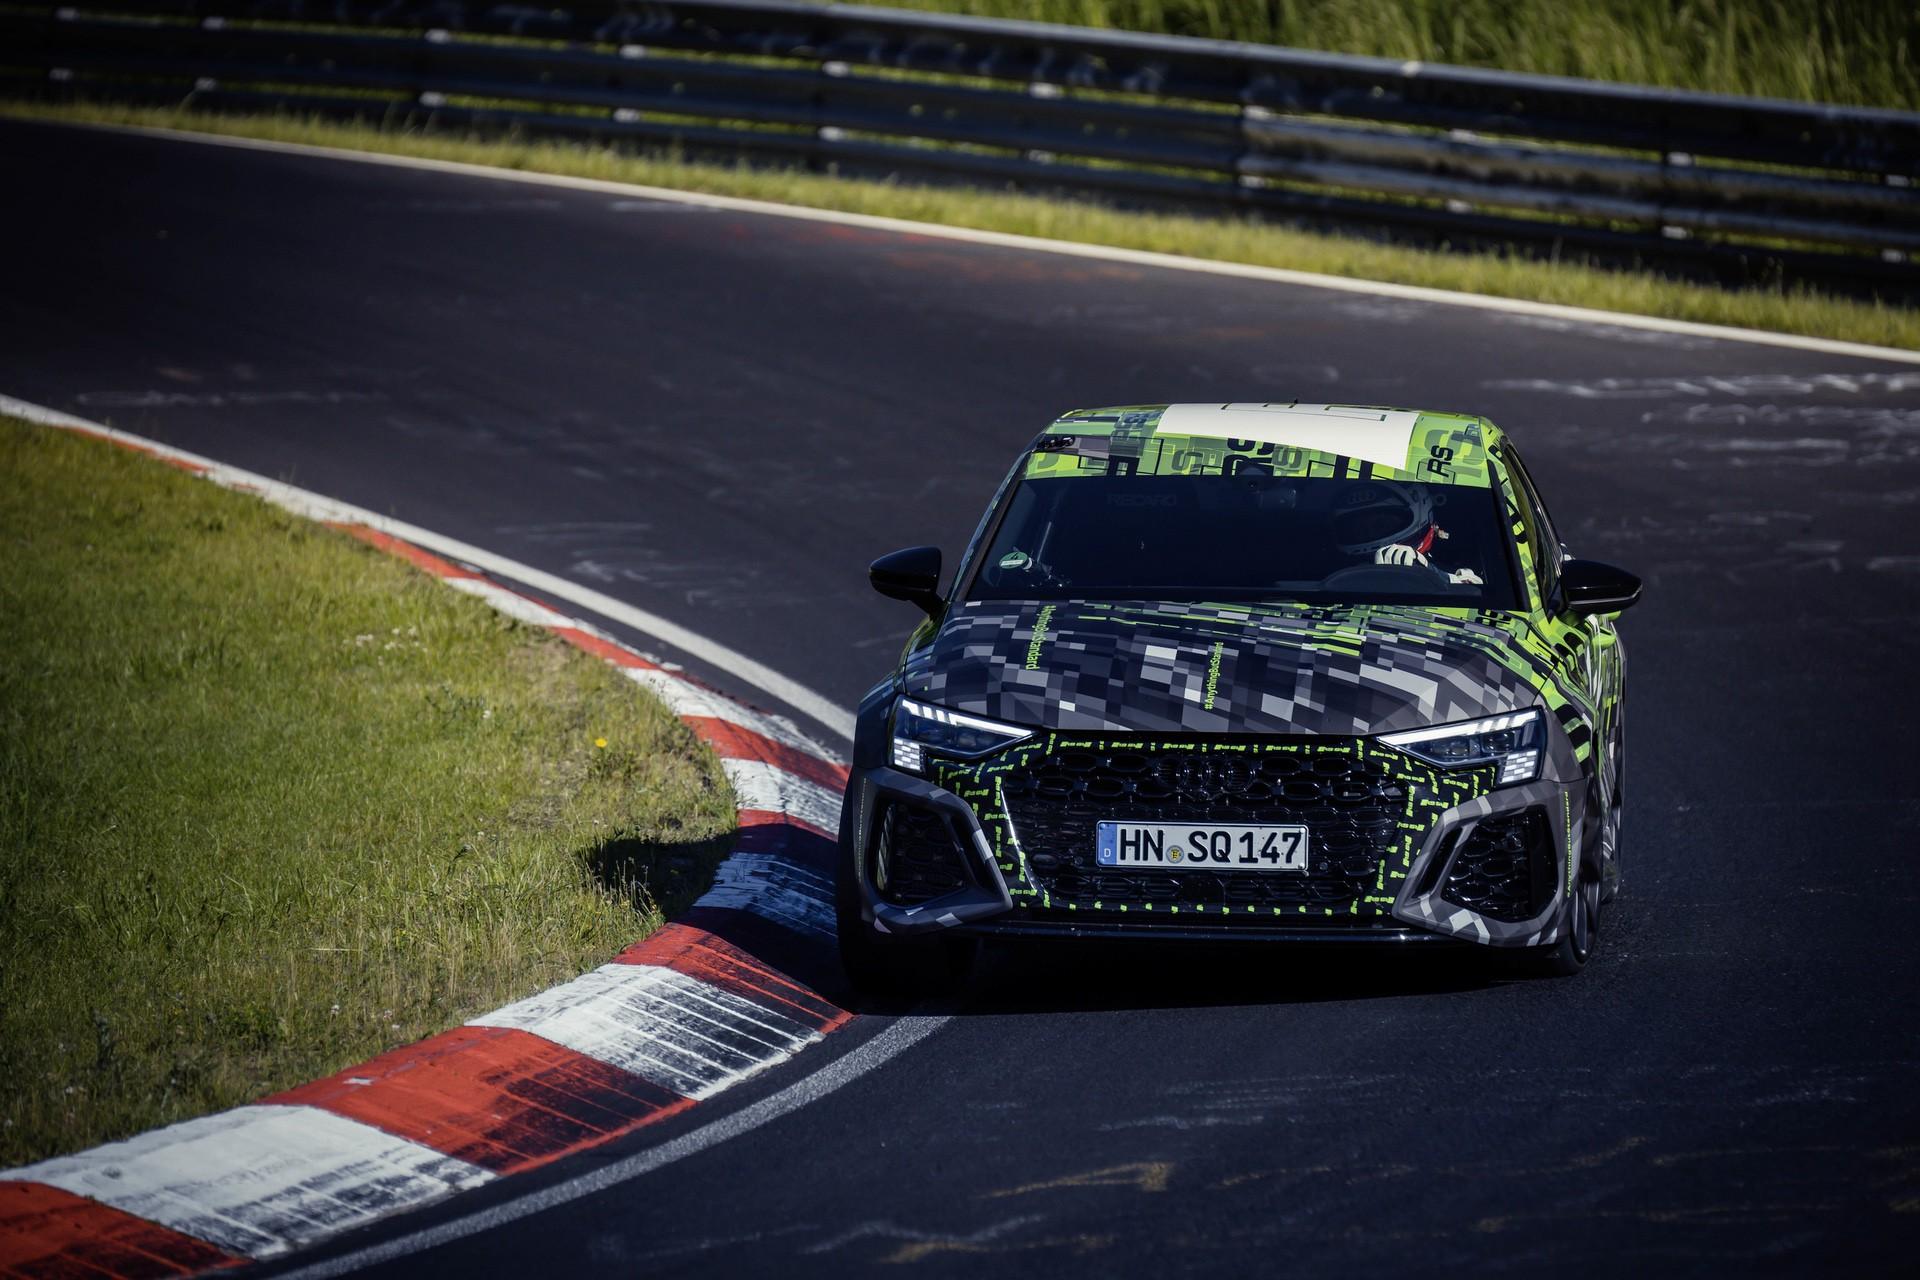 Audi_RS3_Sedan_Nurburgring_lap_record-0010